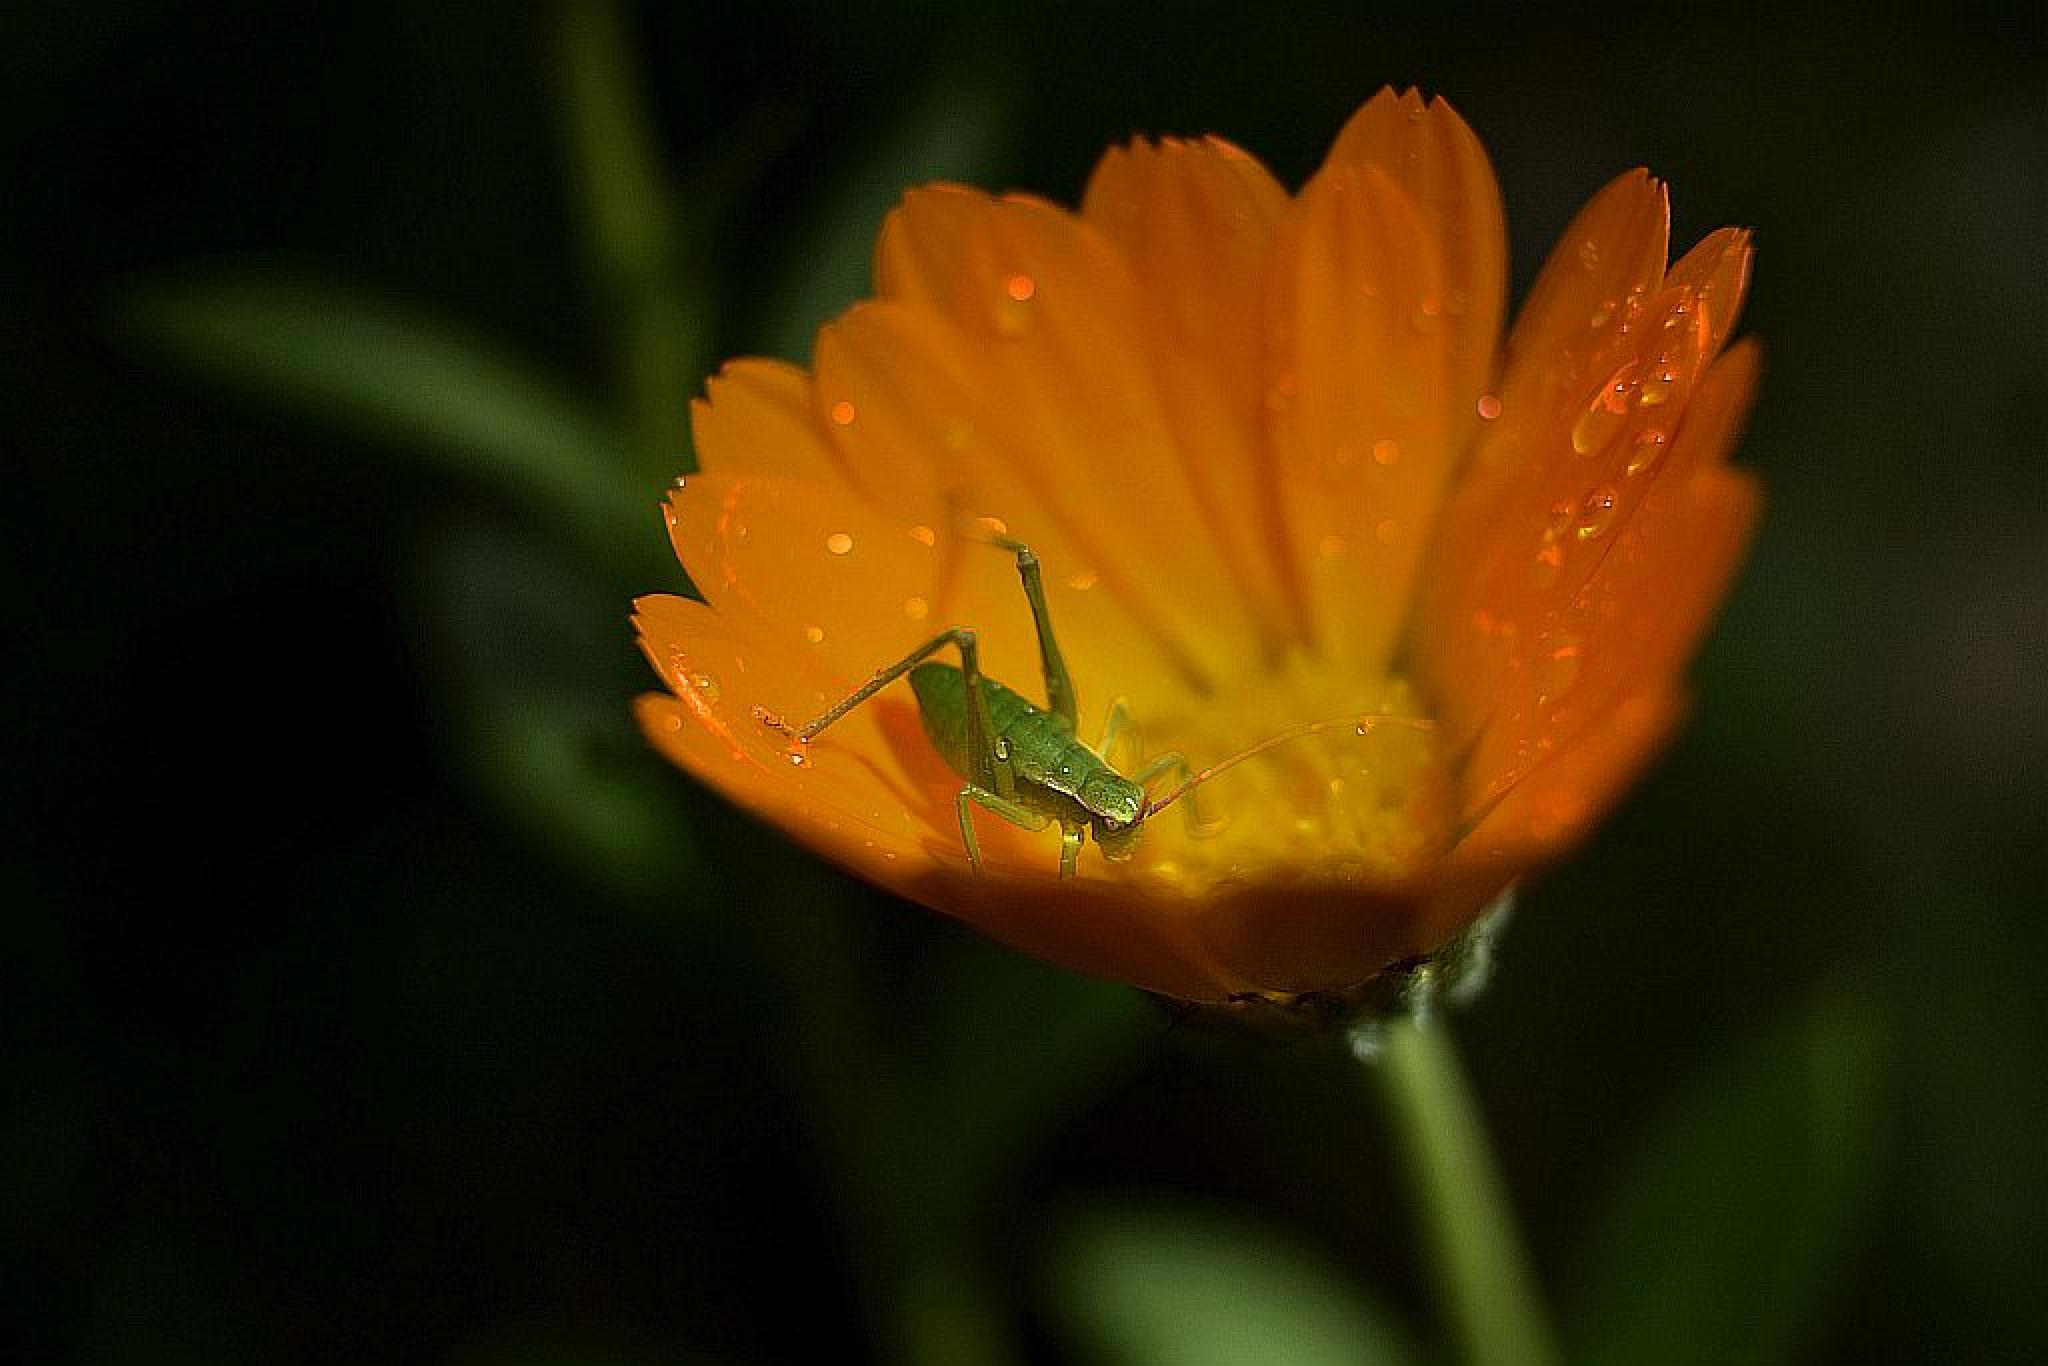 ın the orange by cemalsepici